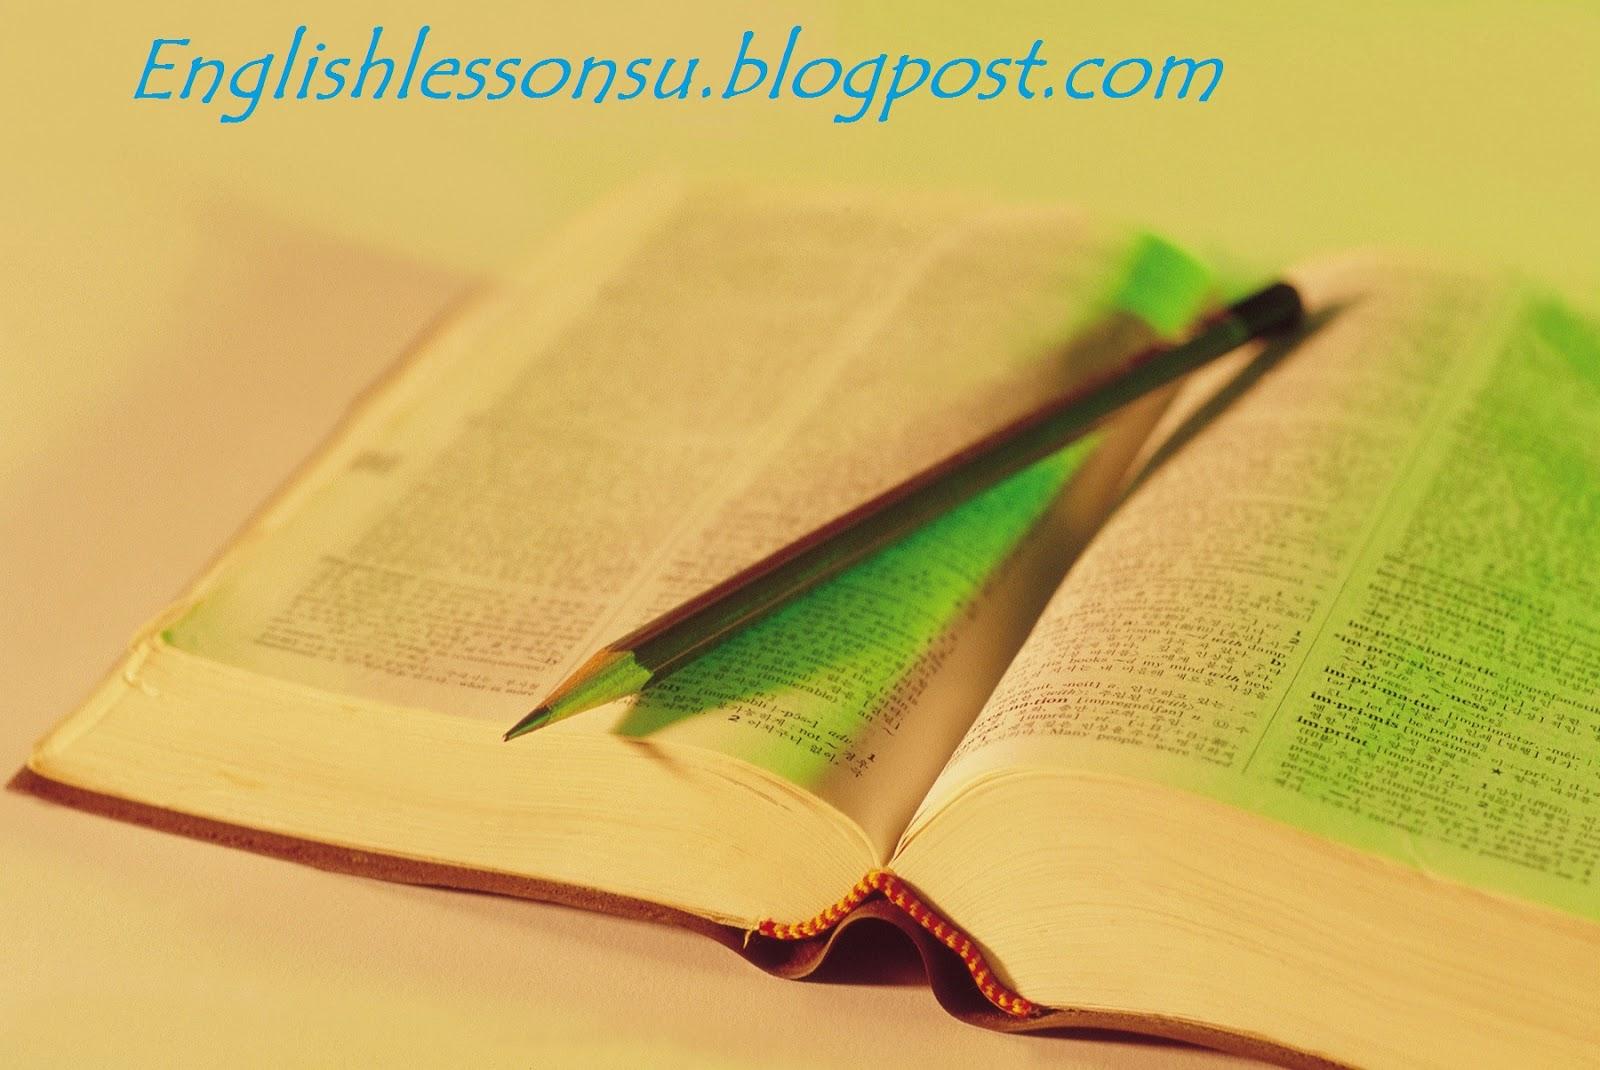 https://www.blogger.com/blogger.g?blogID=629717503532797730#editor/target=post;postID=1677947322899467189